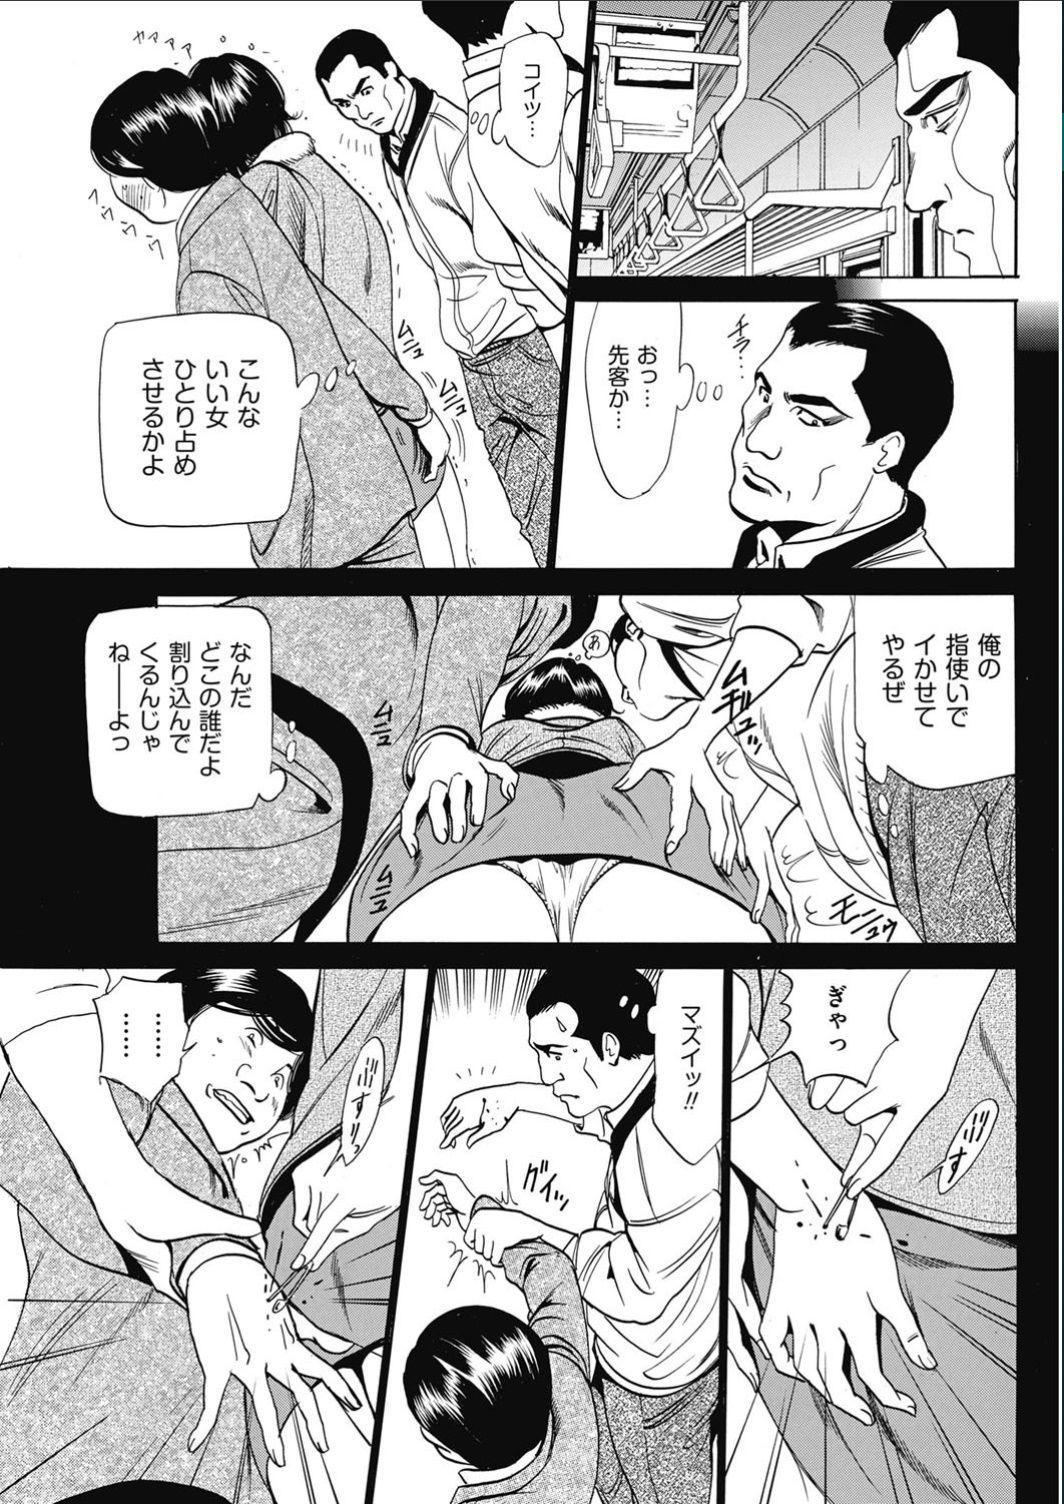 Wa Usuki Ipa a 1-10 103